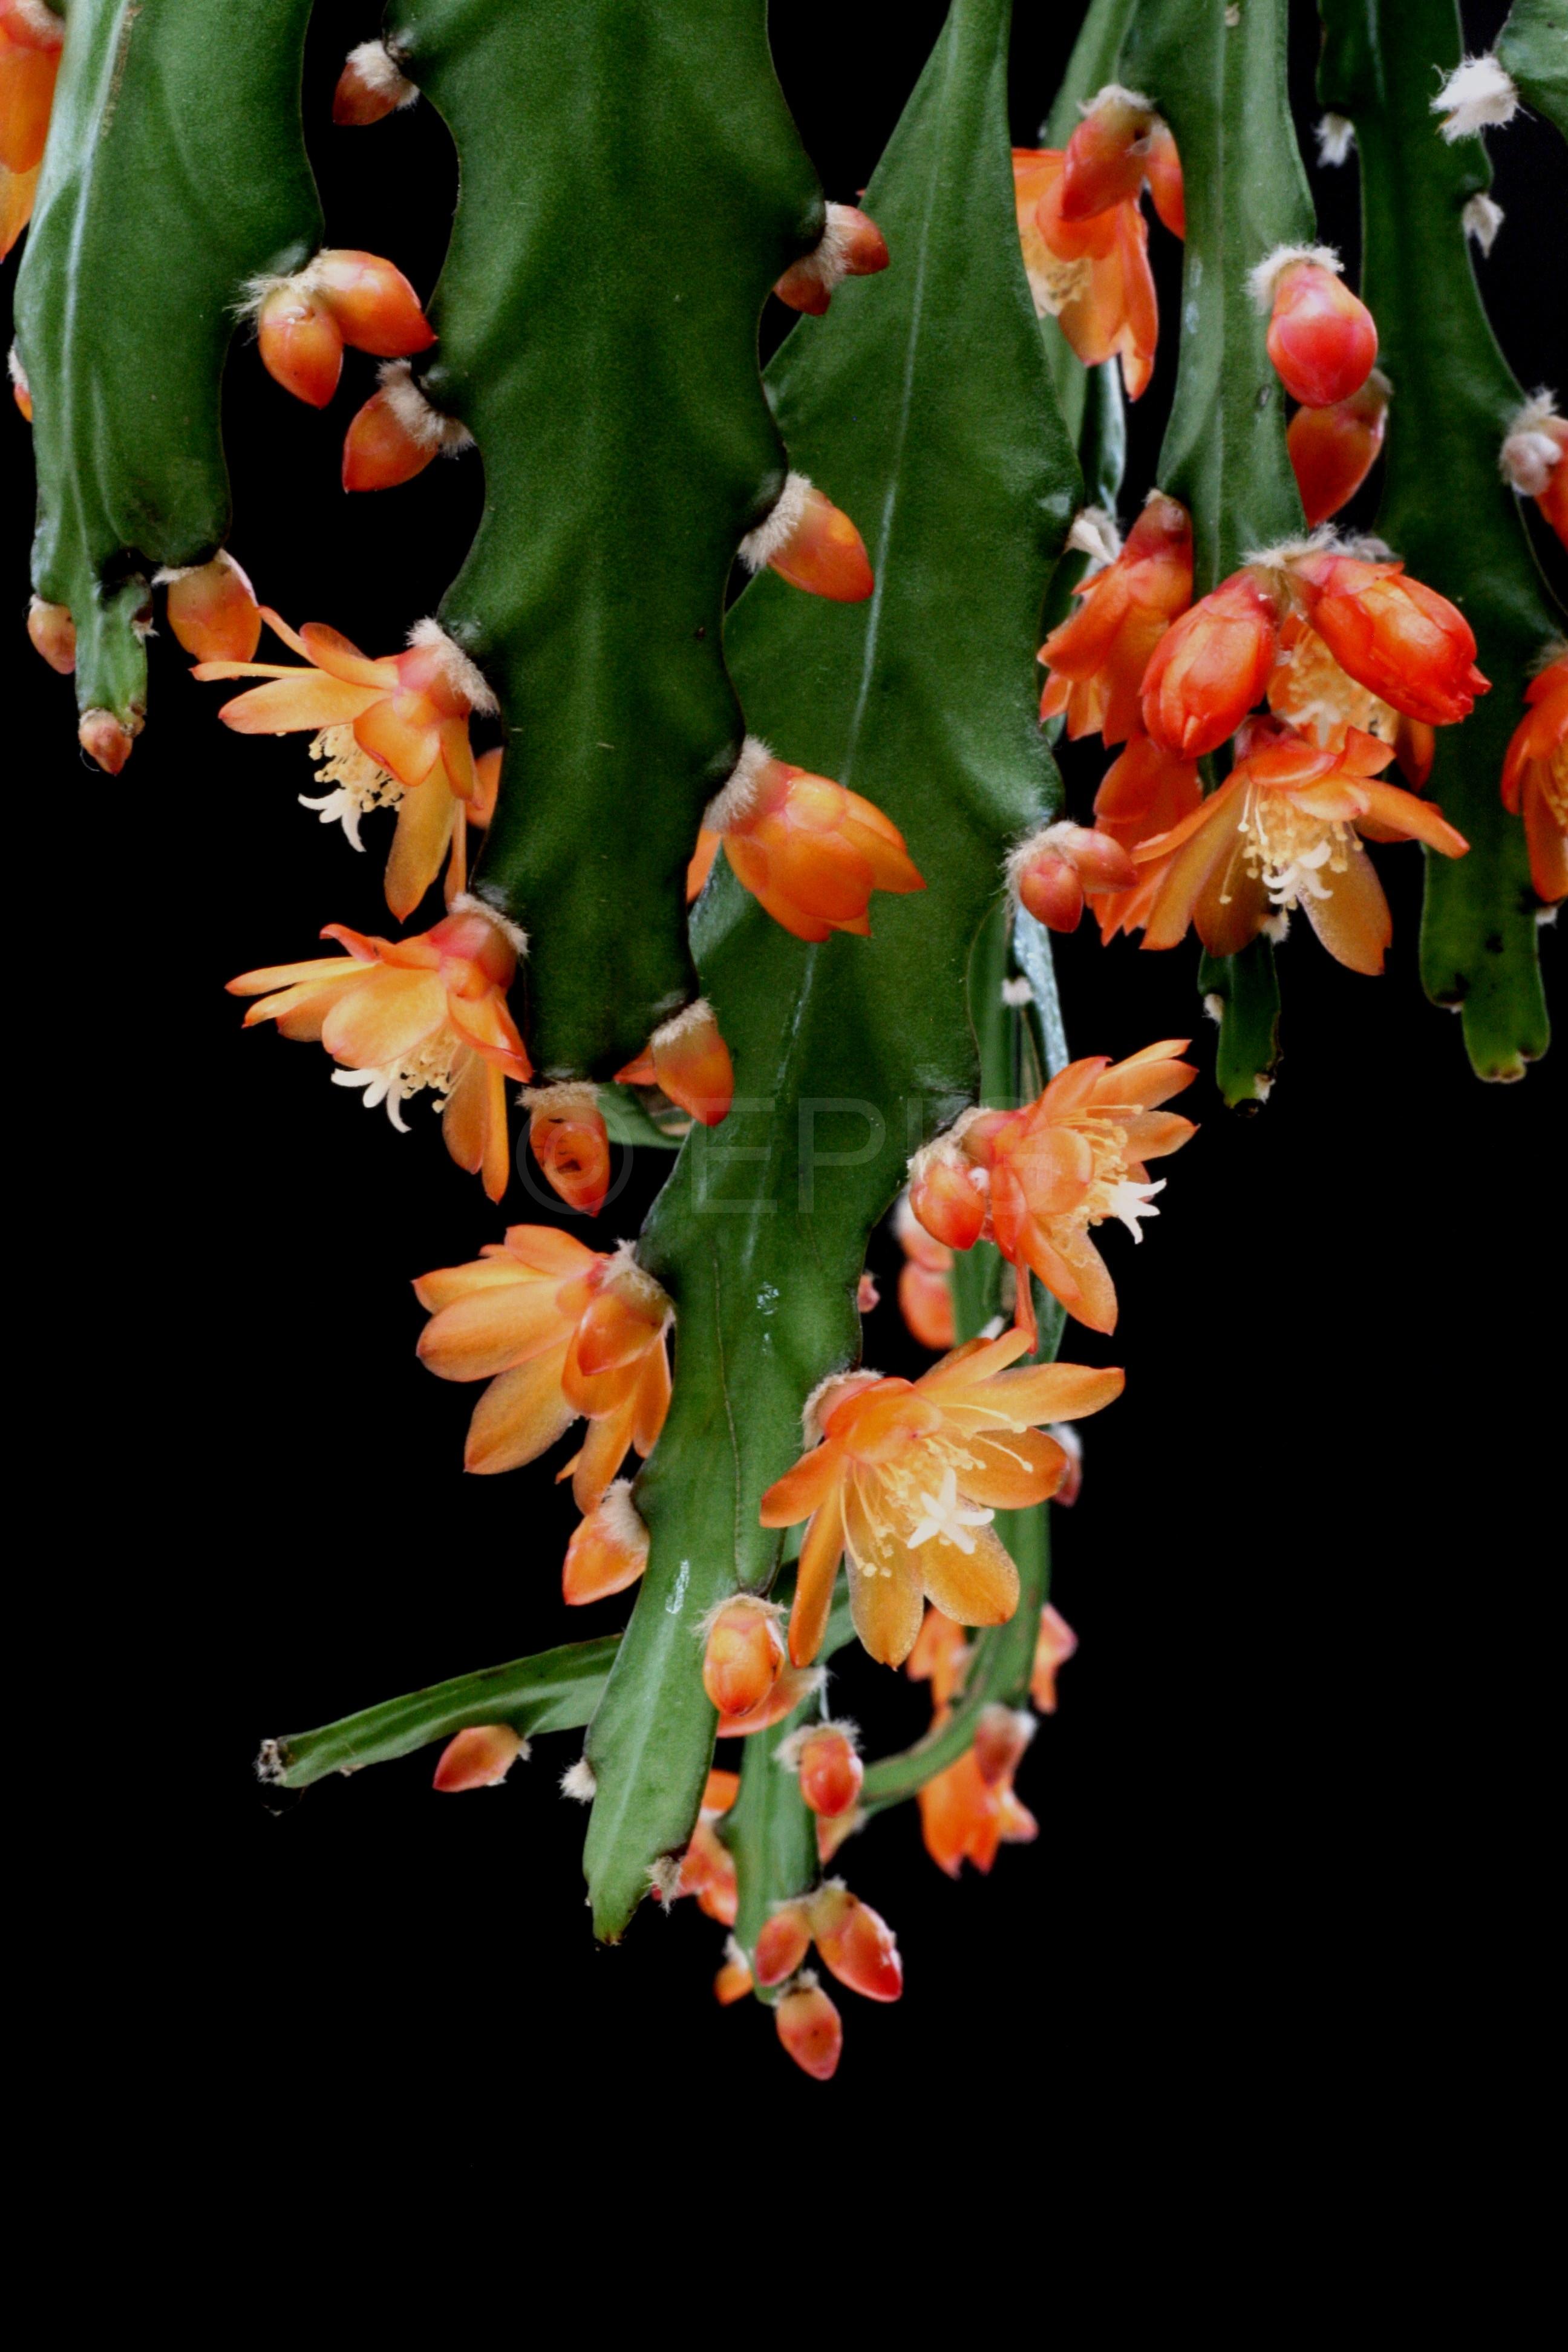 Pfeiffera asuntapatensis (Kessler 9800) (Foto Jochen Bockemühl)